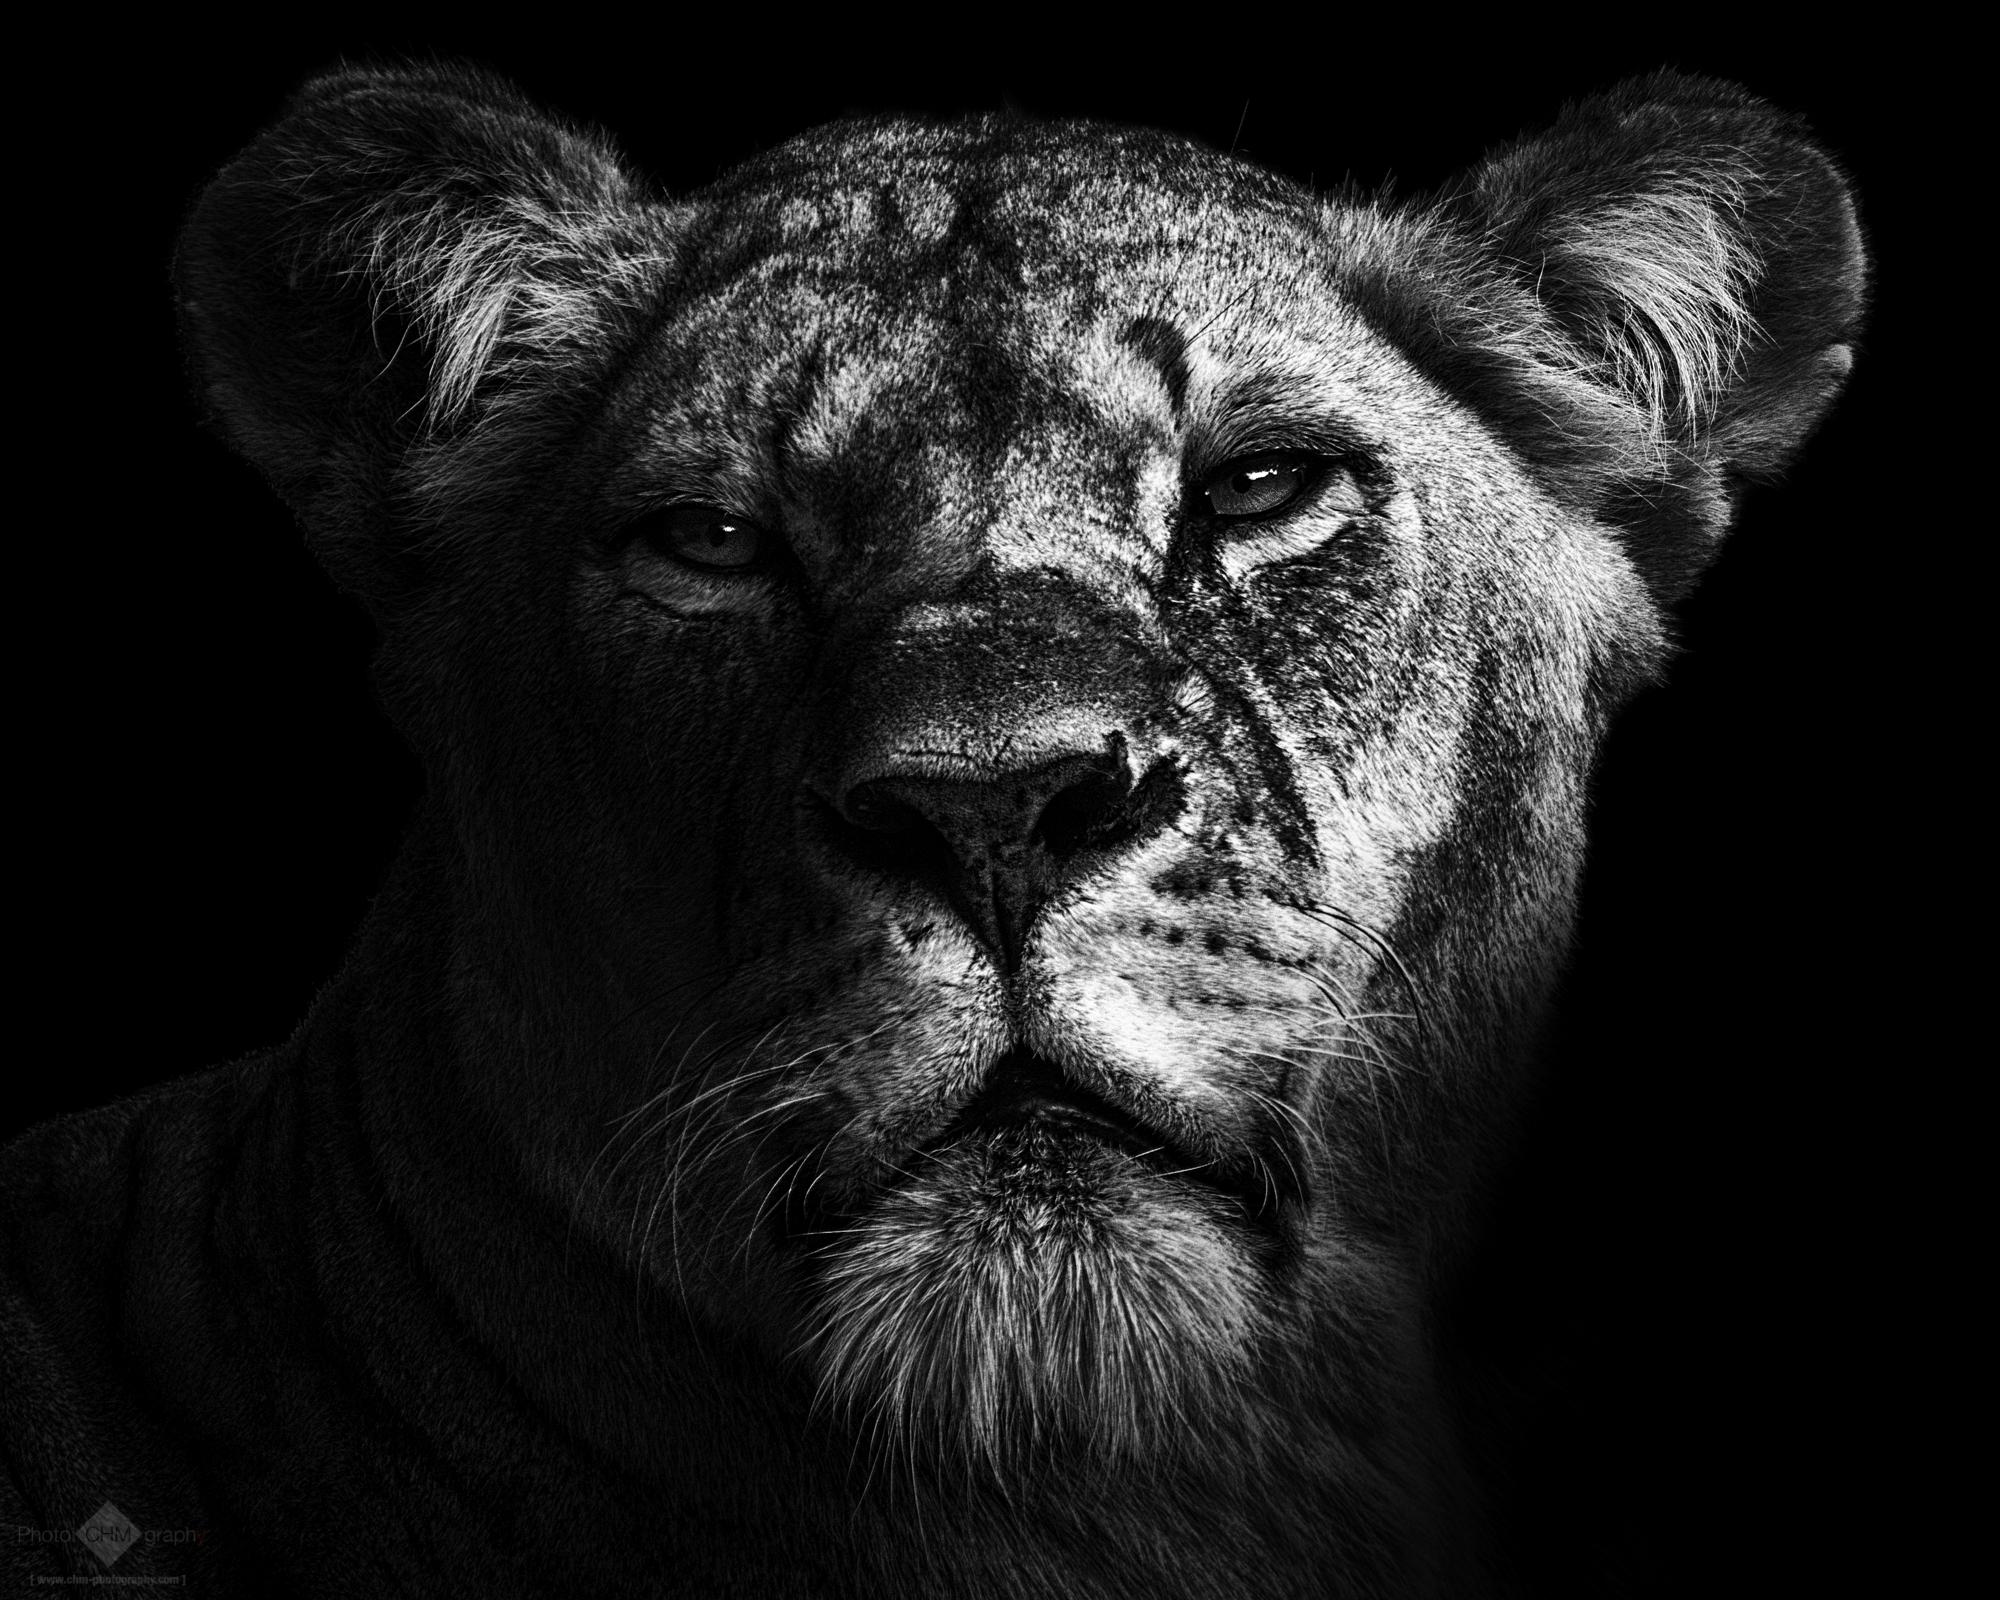 Lioness photo